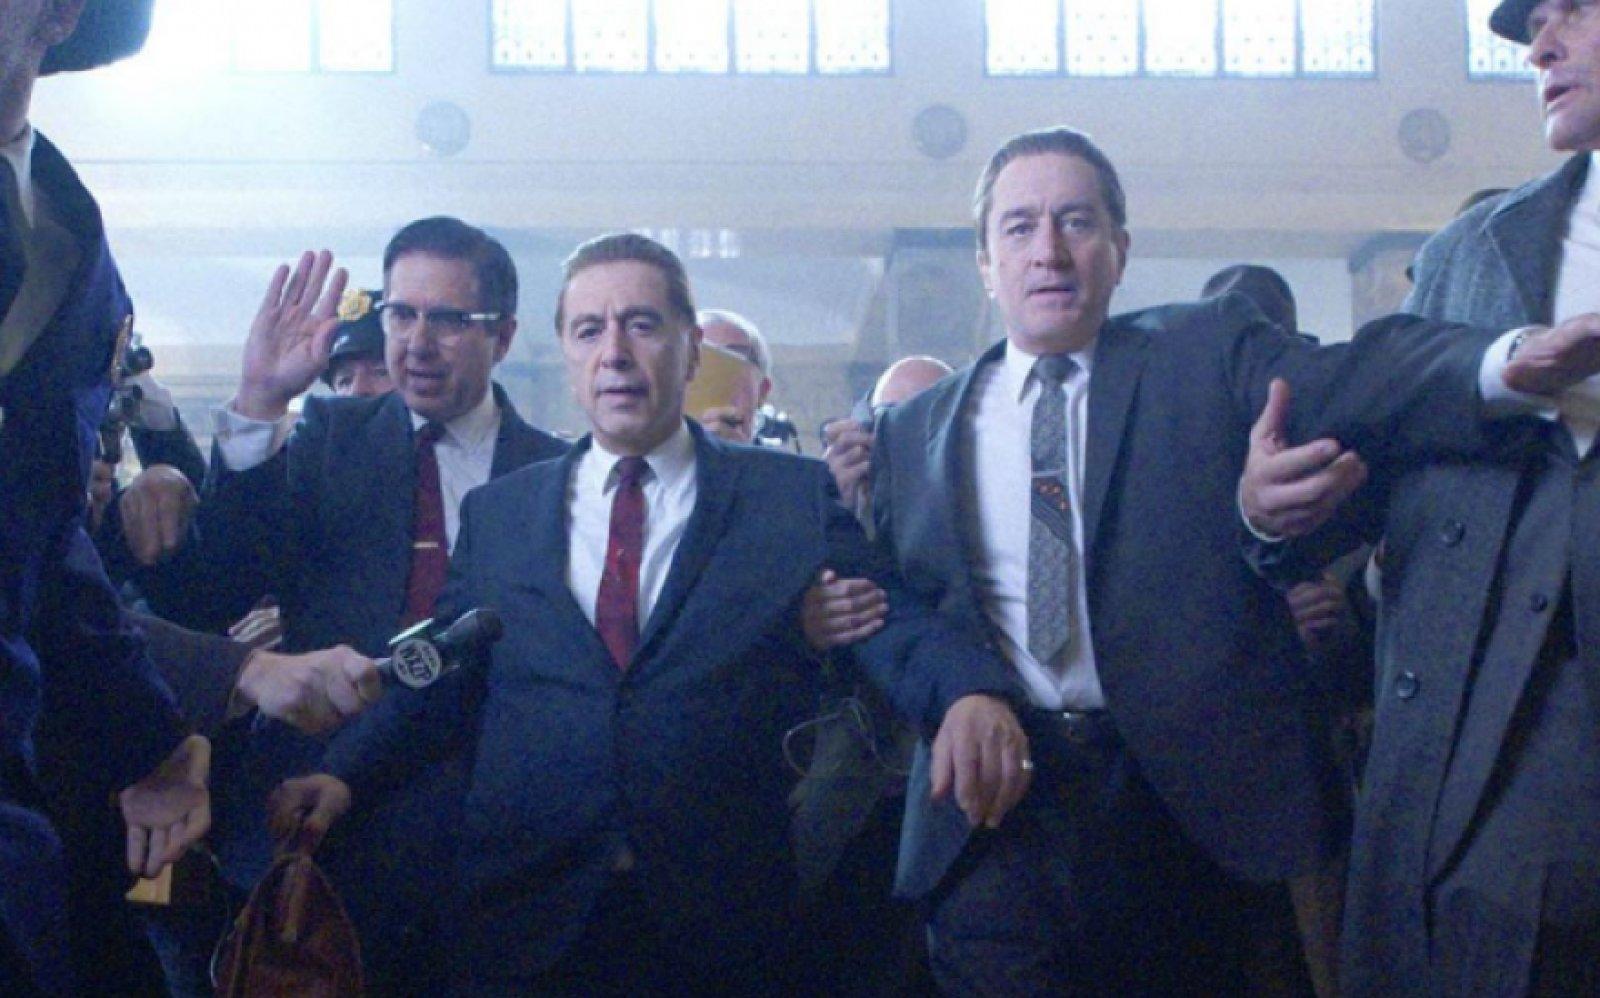 The Irishman: Βλέπουμε την καινούργια ταινία του Scorsese